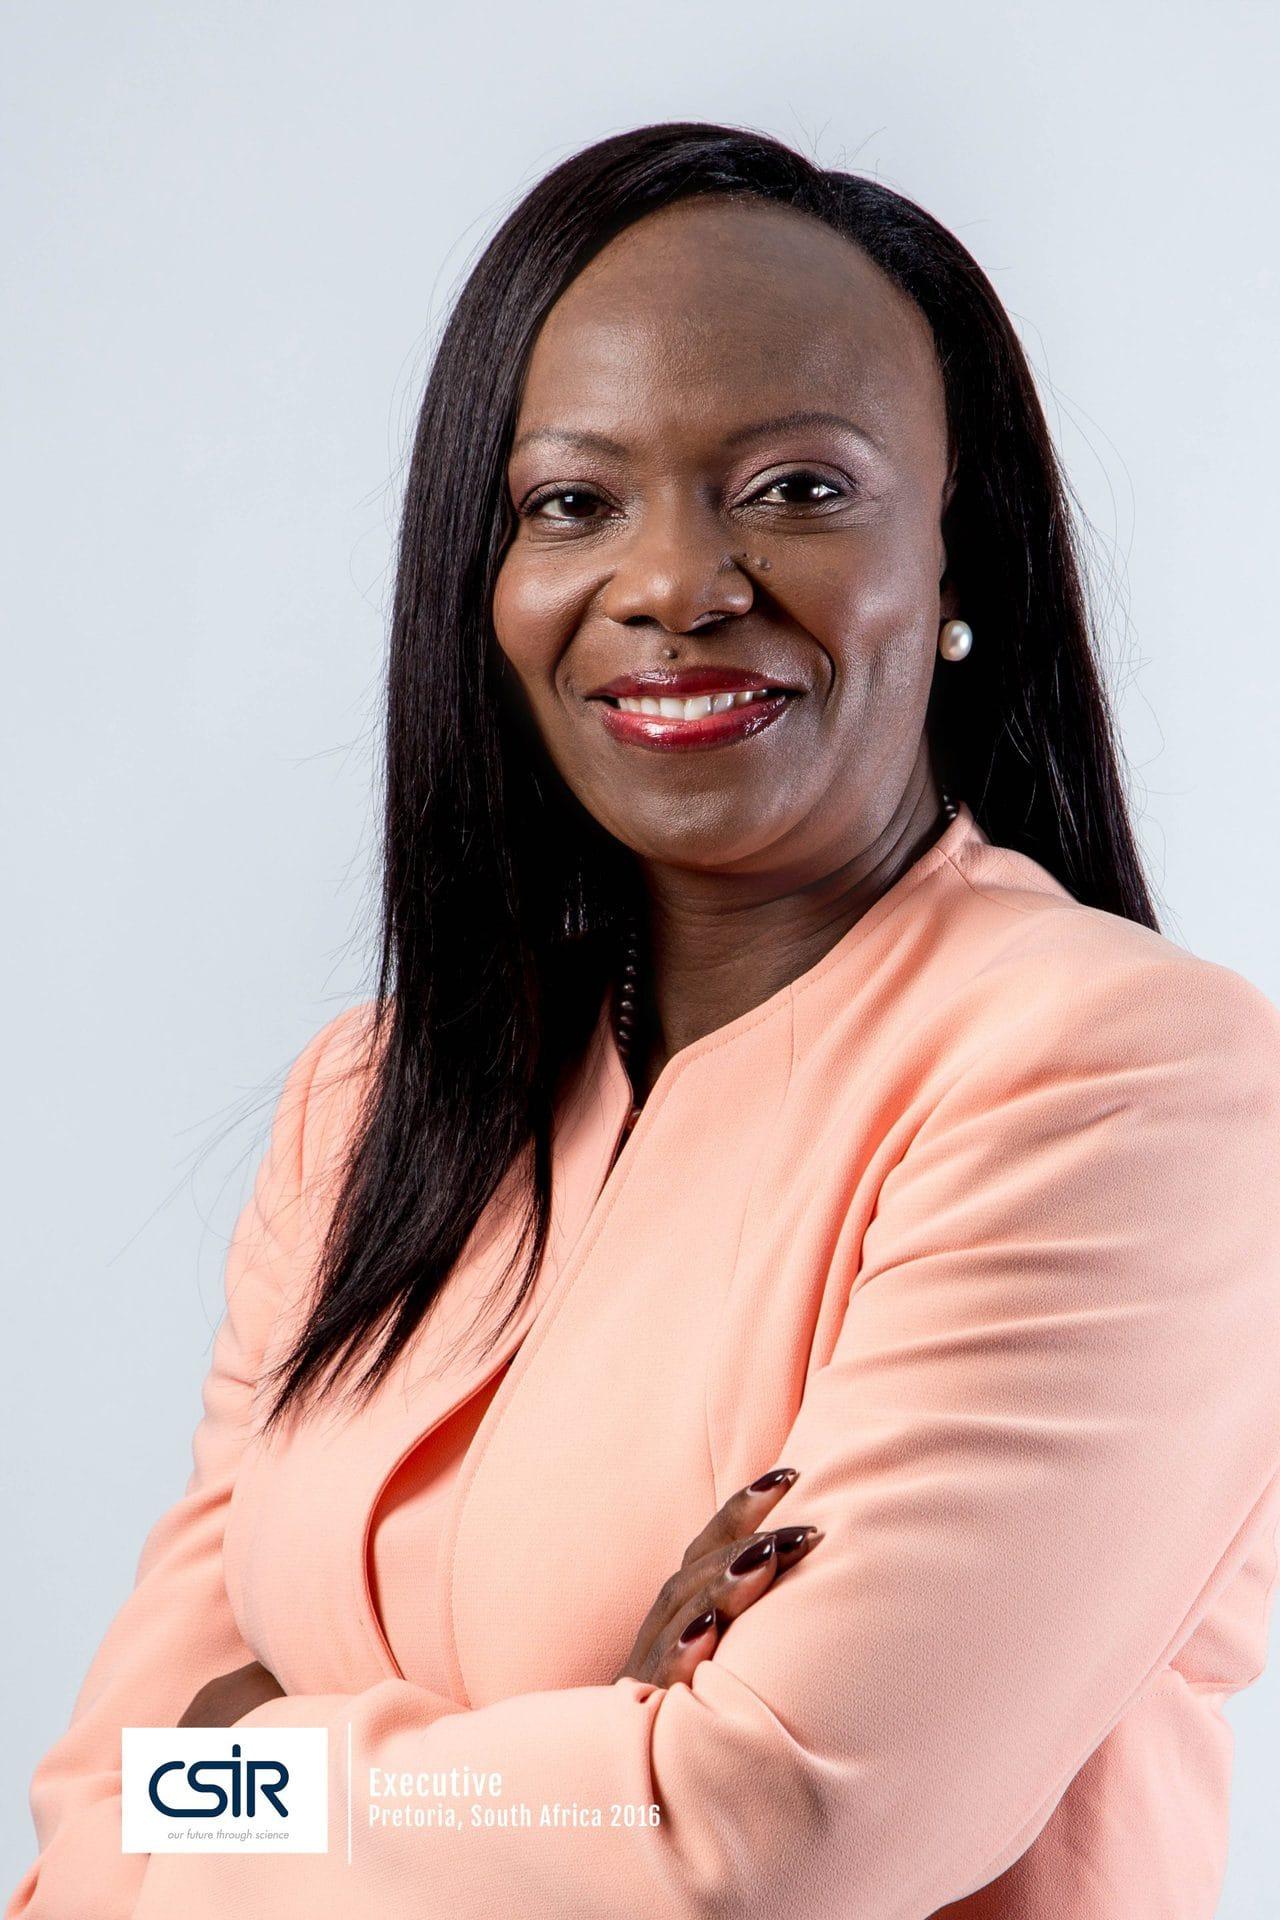 Black Women Executive in Pink Jacket